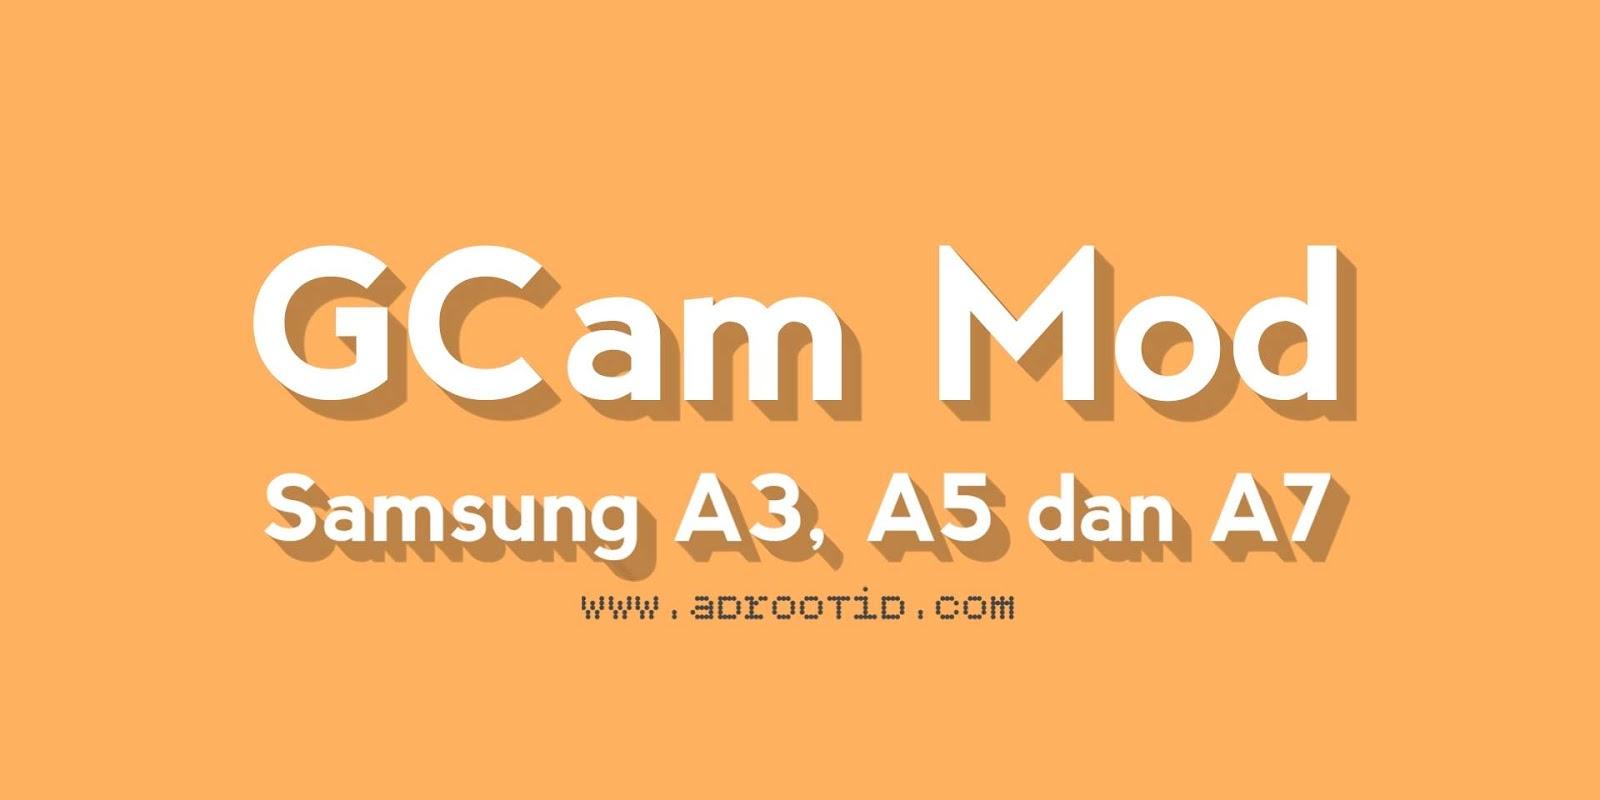 Gcam mod untuk samsung A3 A5 A7